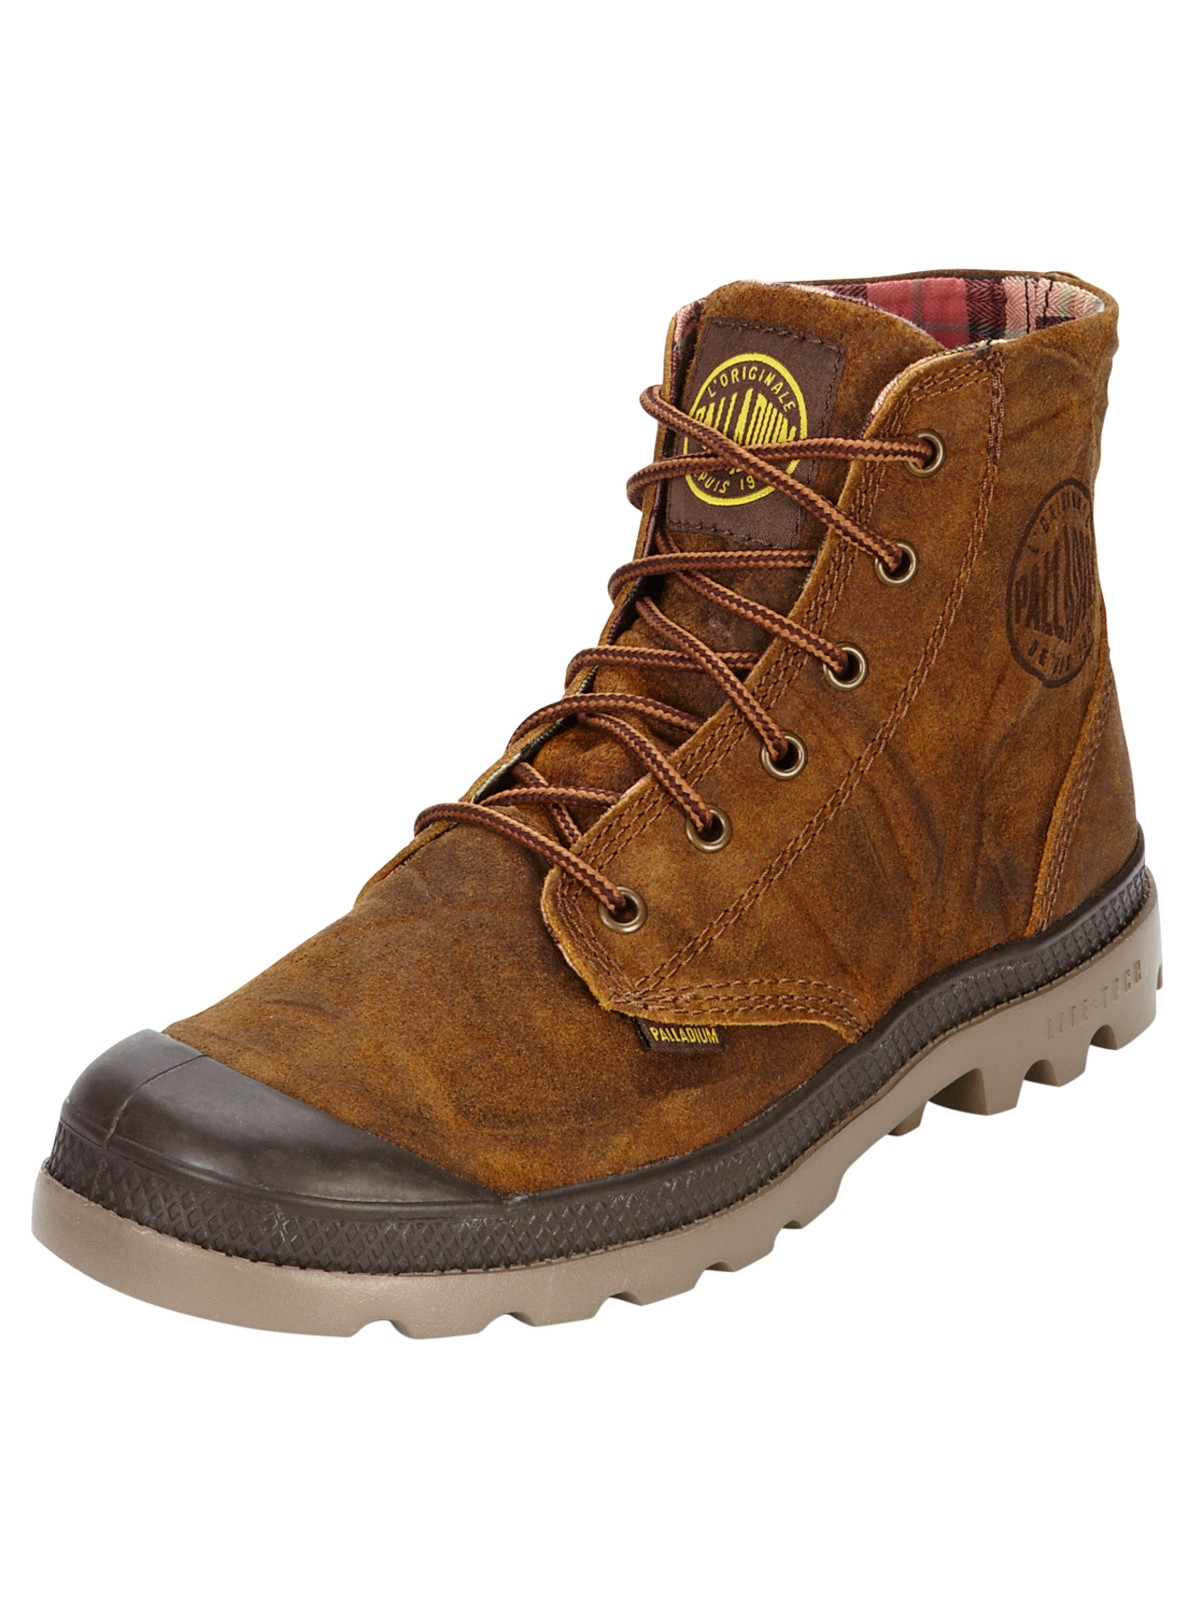 palladium palladium pa high lite leather boots in brown